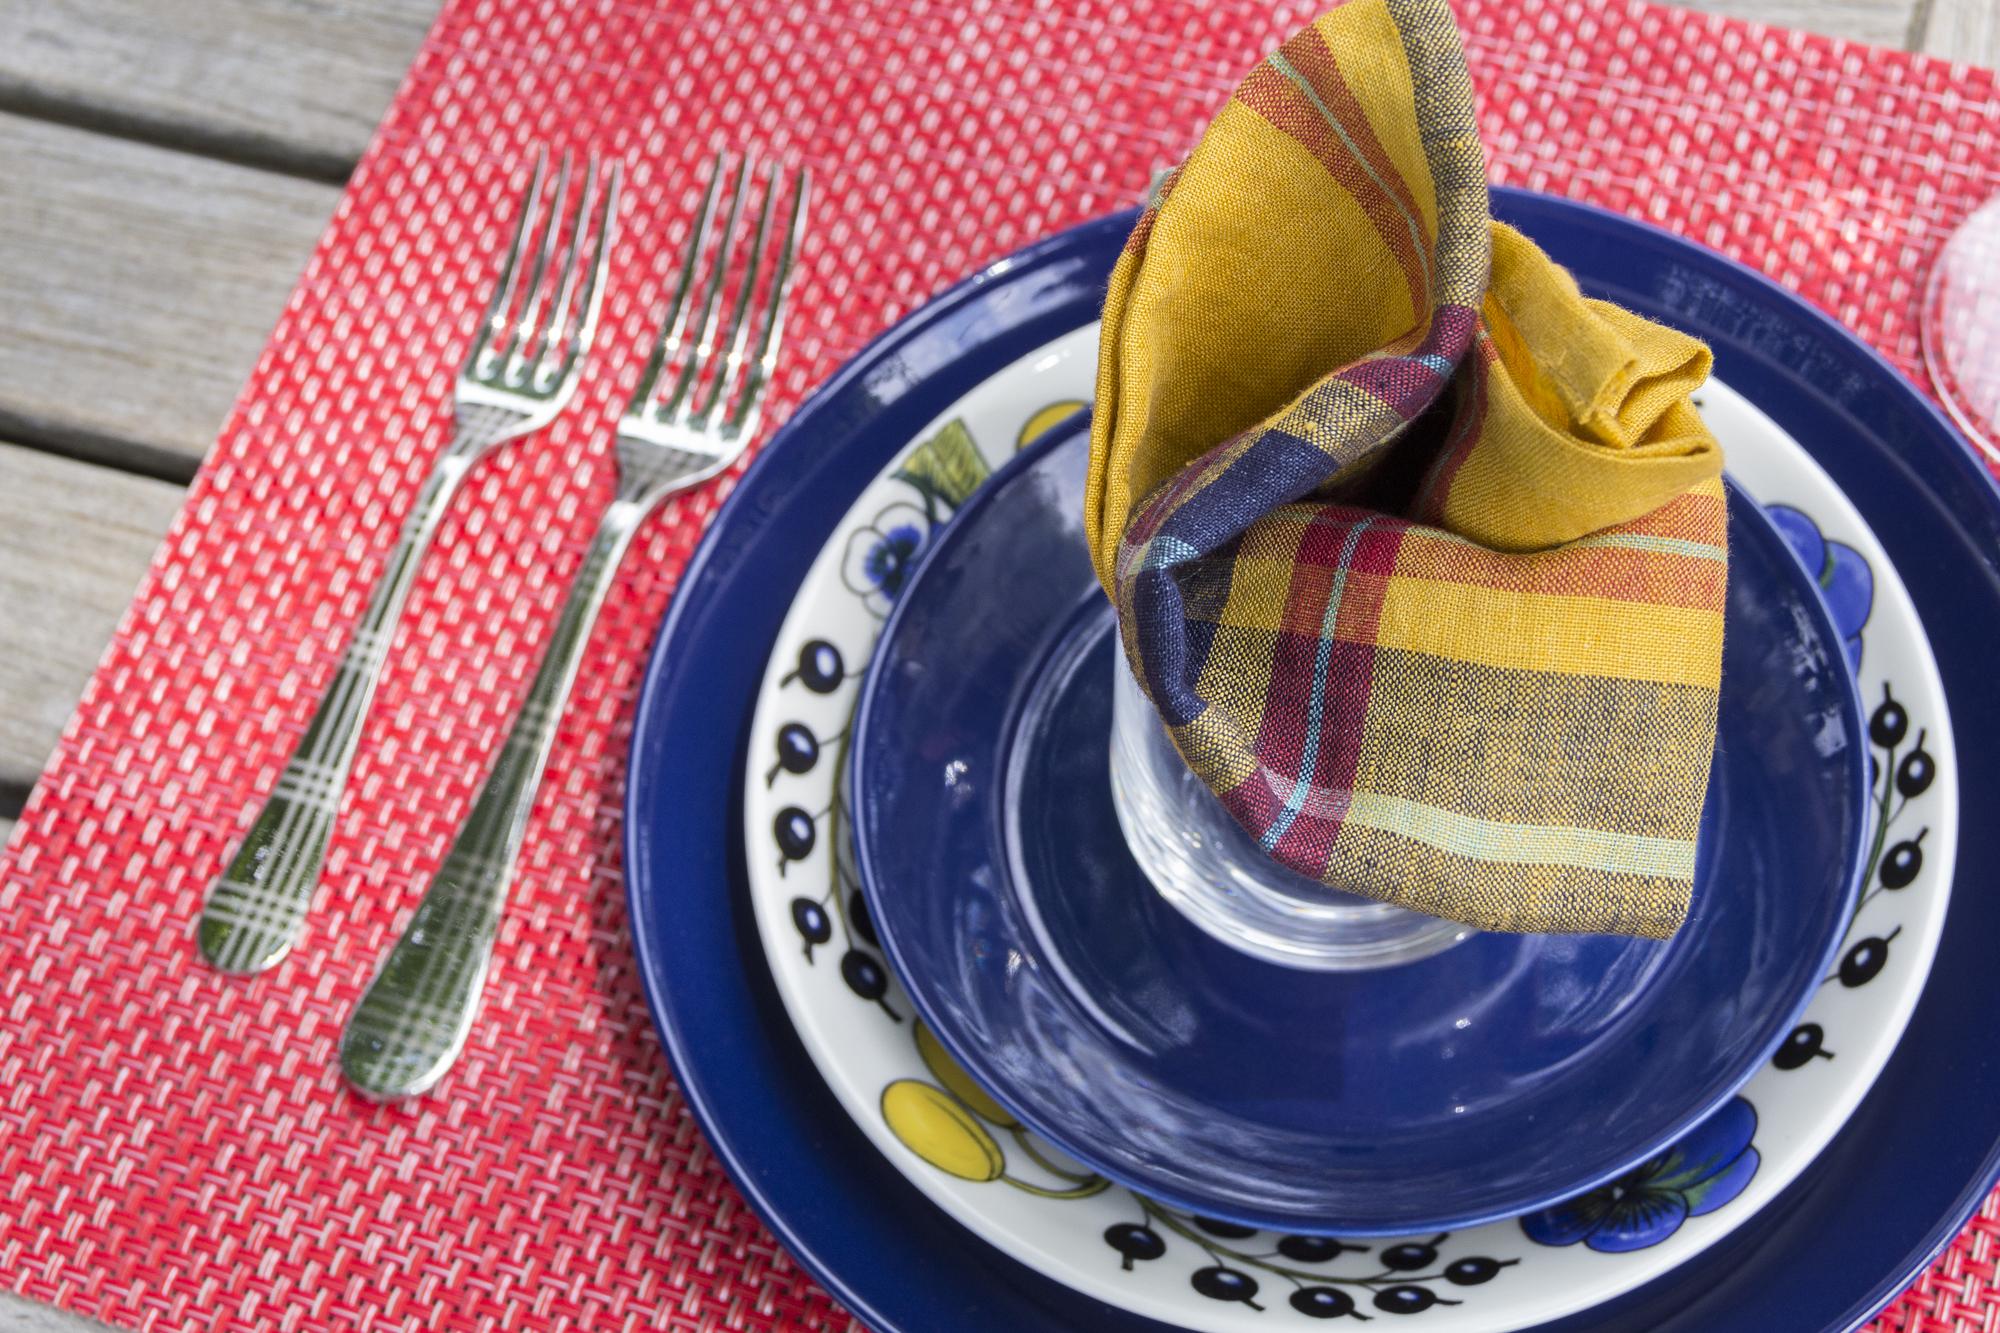 Dining Al Fresco with iittala and Arabia